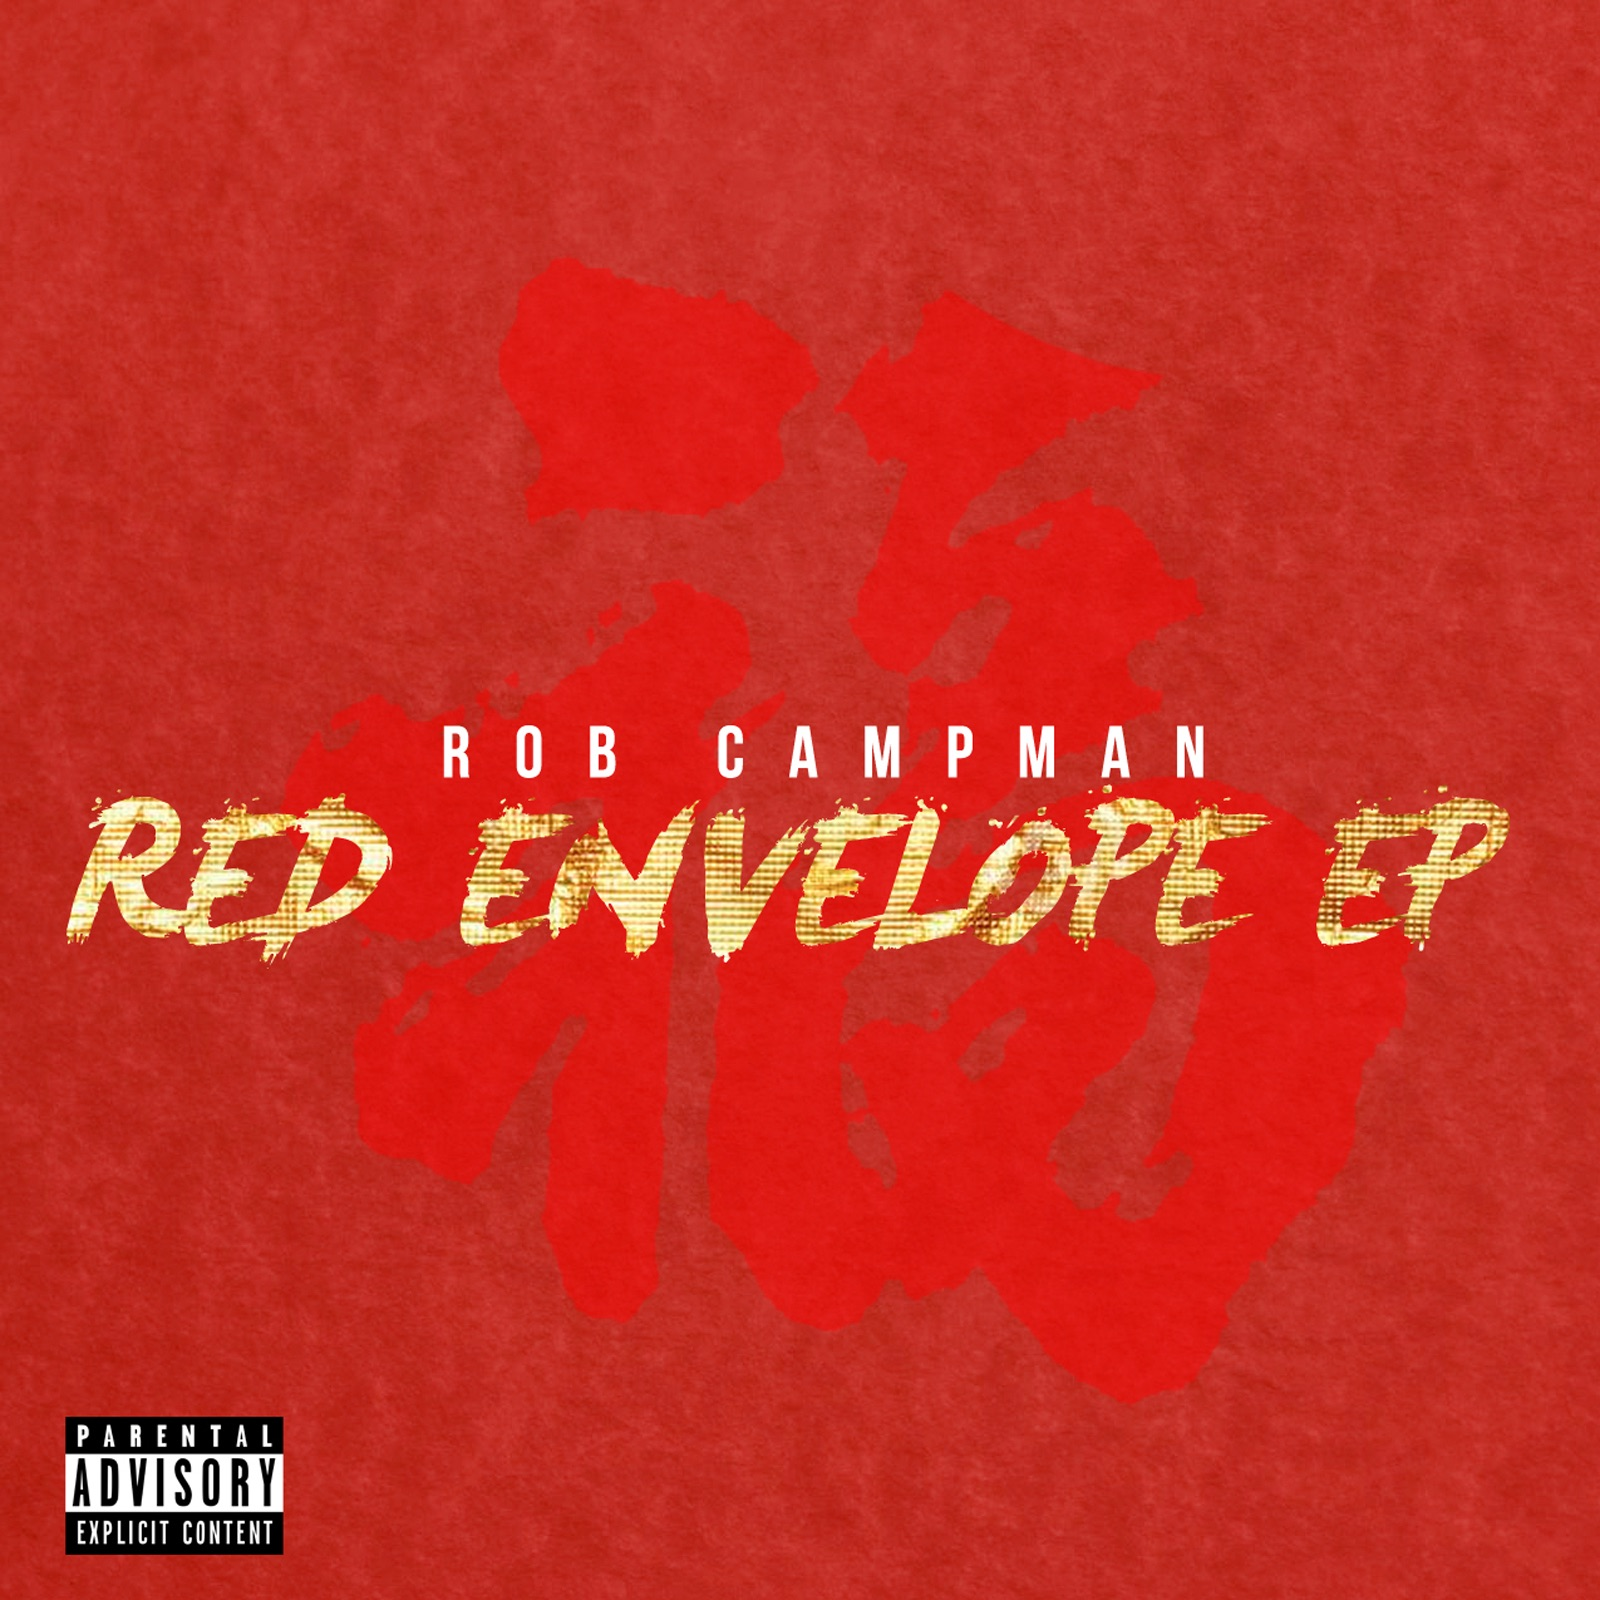 Red Envelope EP